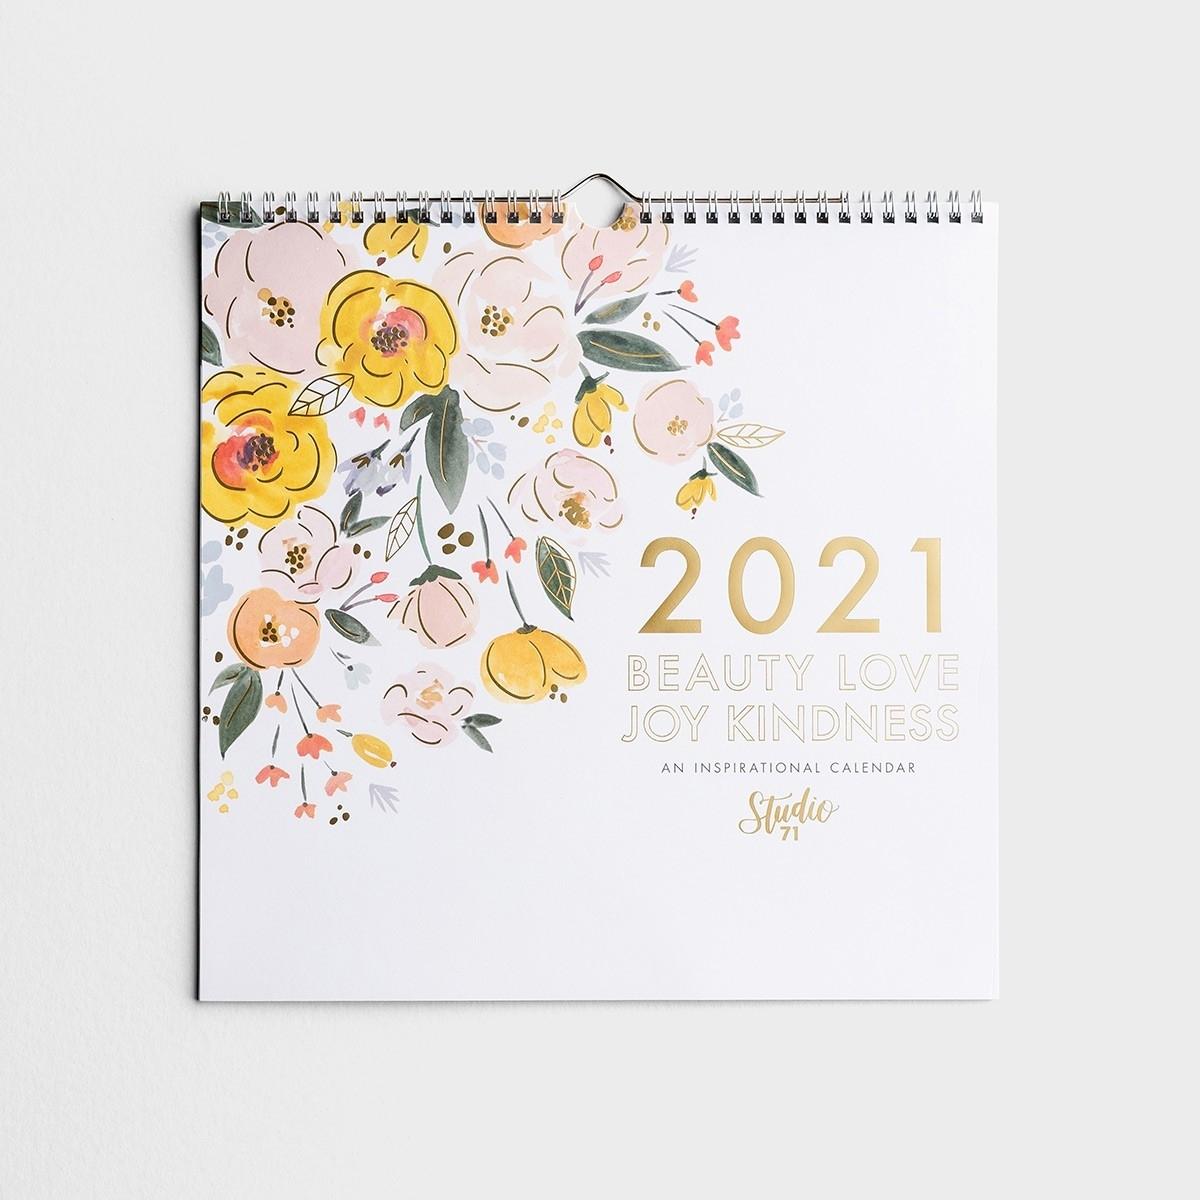 Studio 71 - Beauty Love Joy Kindness - 2021 Premium Spiral Wall Calendar